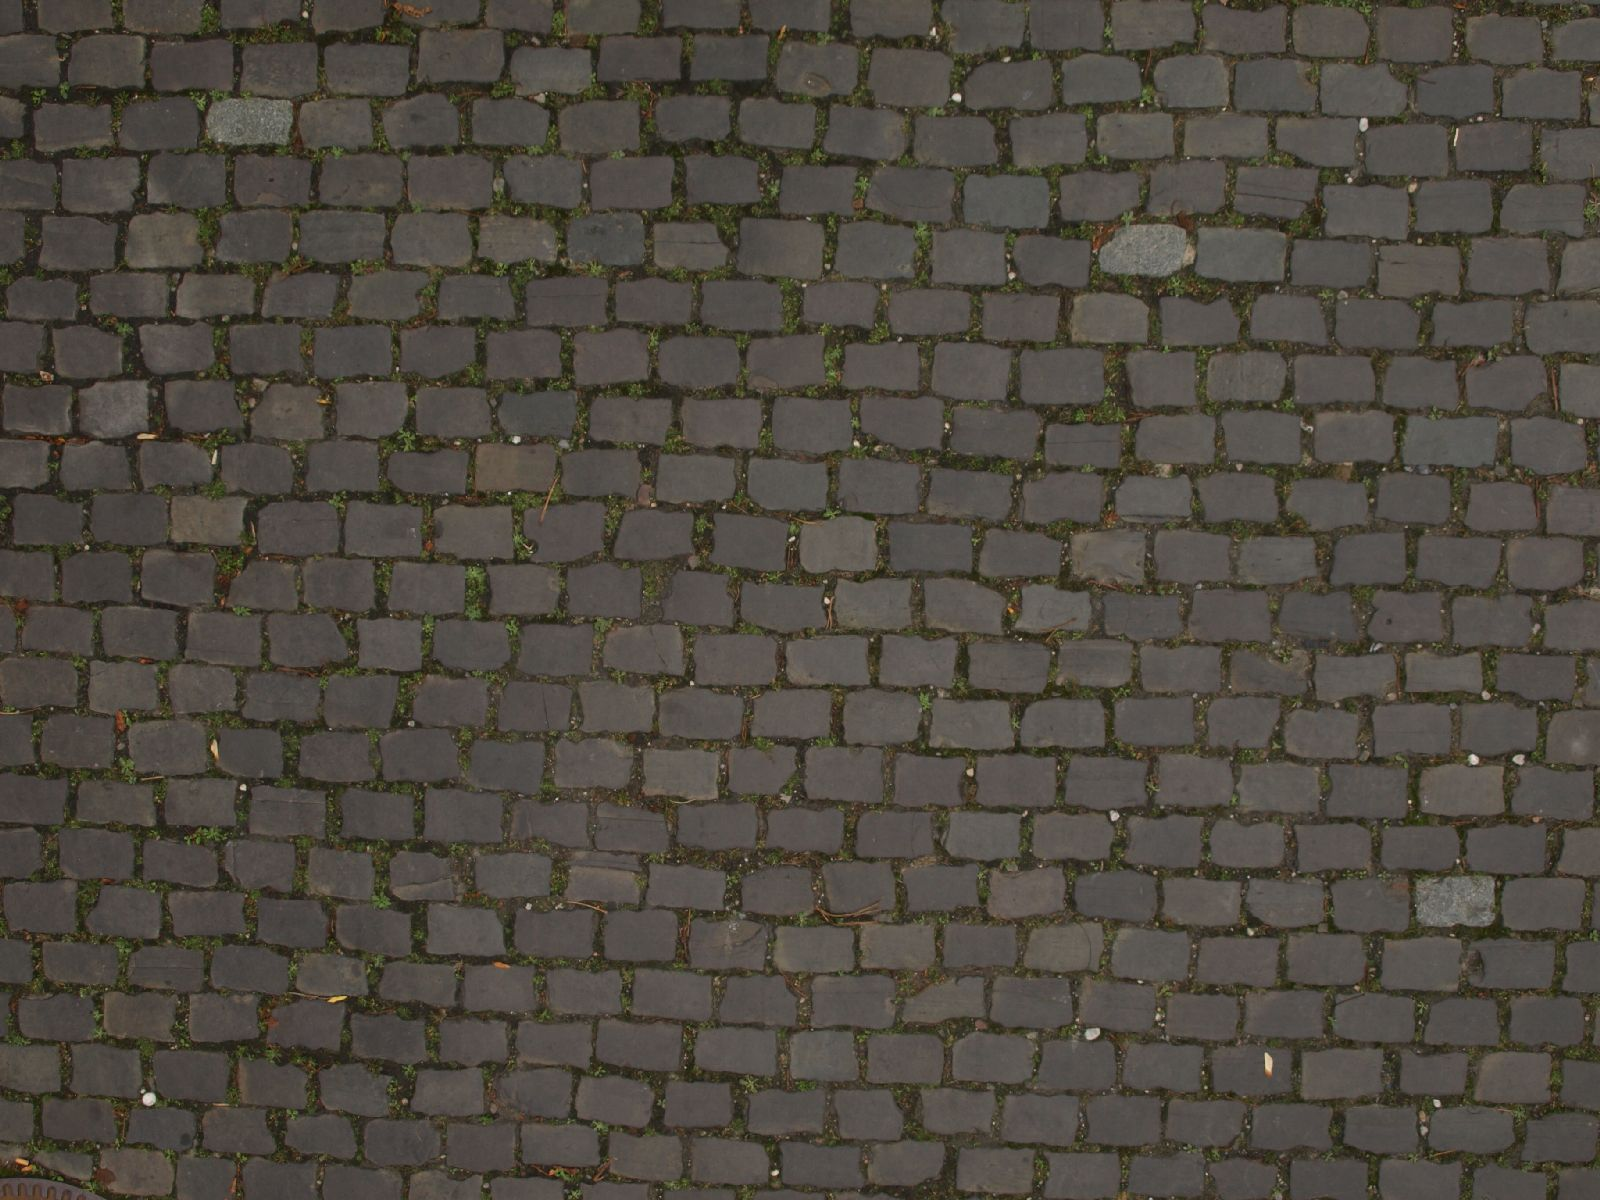 Boden-Gehweg-Strasse-Buergersteig-Textur_A_PA030021